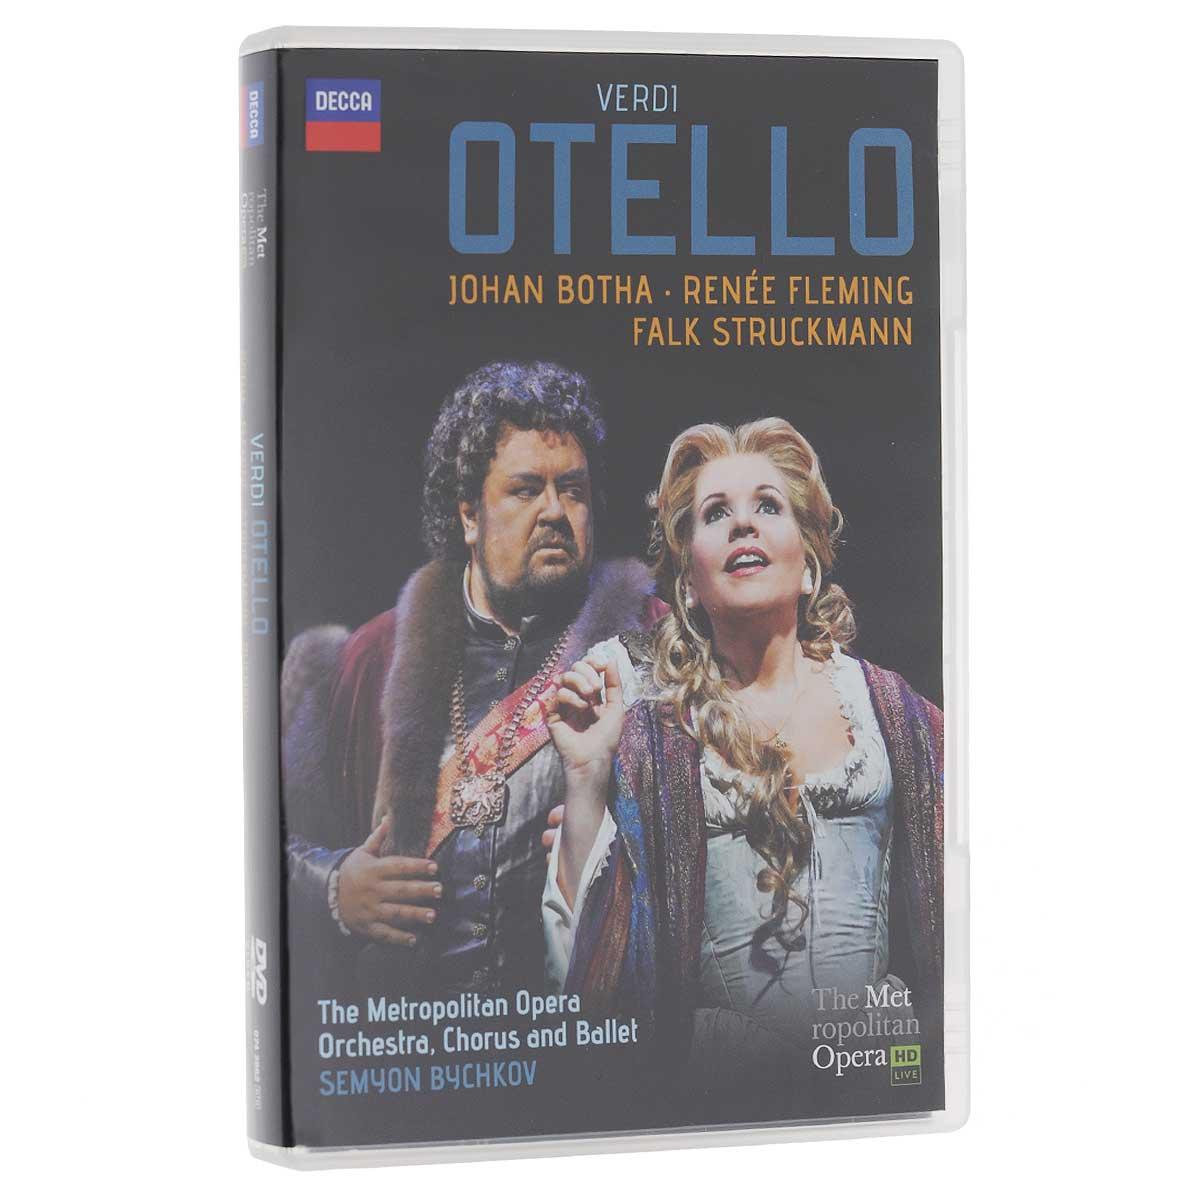 Semyon Bychkov. Giuseppe Verdi. Otello giuseppe verdi ein maskenball un ballo in maschera